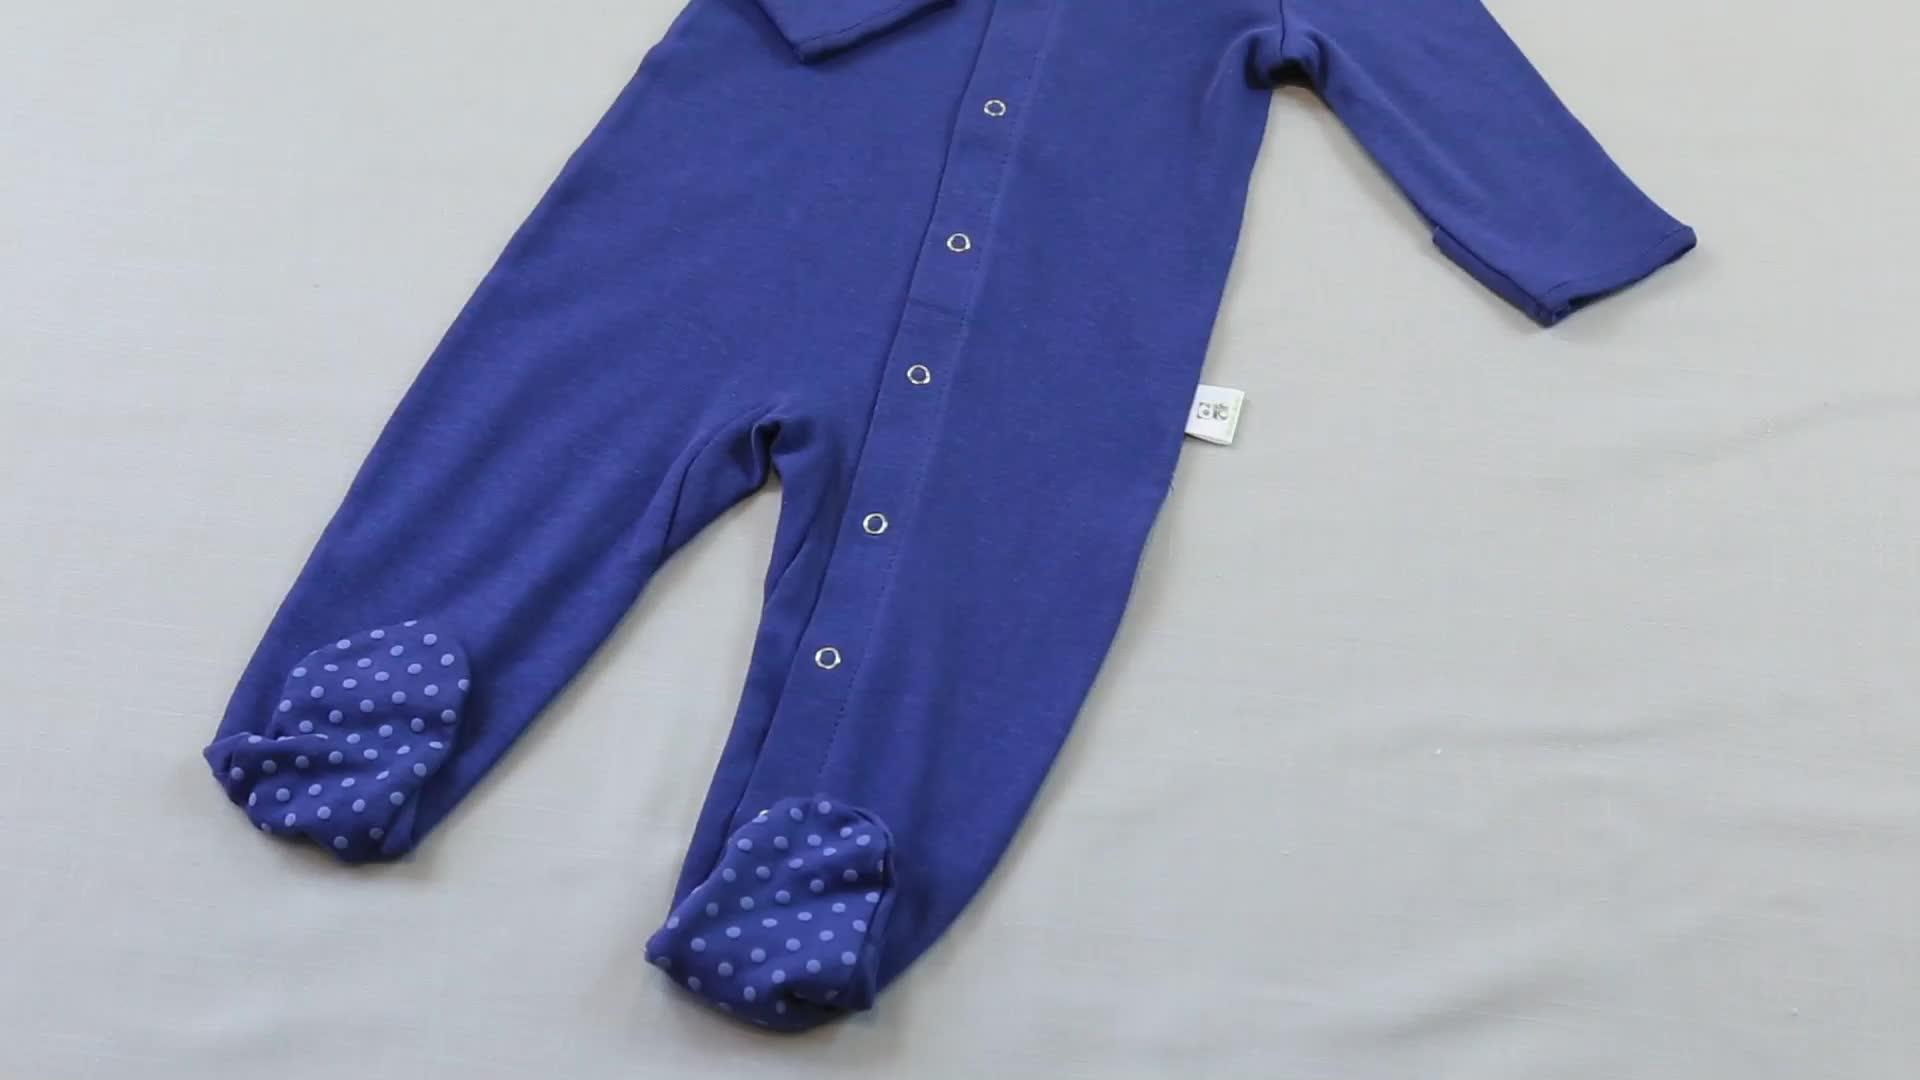 Zafer bebek GOTS sertifikalı organik pamuk bebek pijama footie uyuyan bebek kıyafetleri bebek pijama